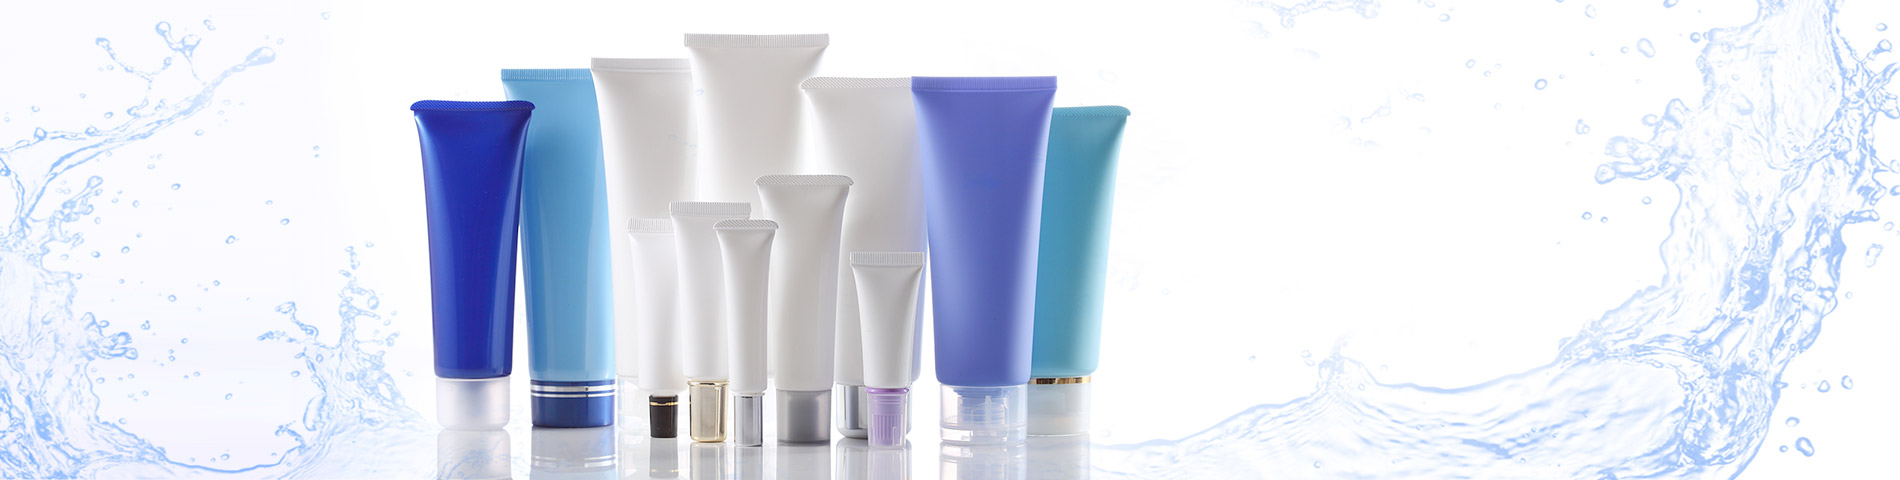 OEM Expert for Cosmetic Tube